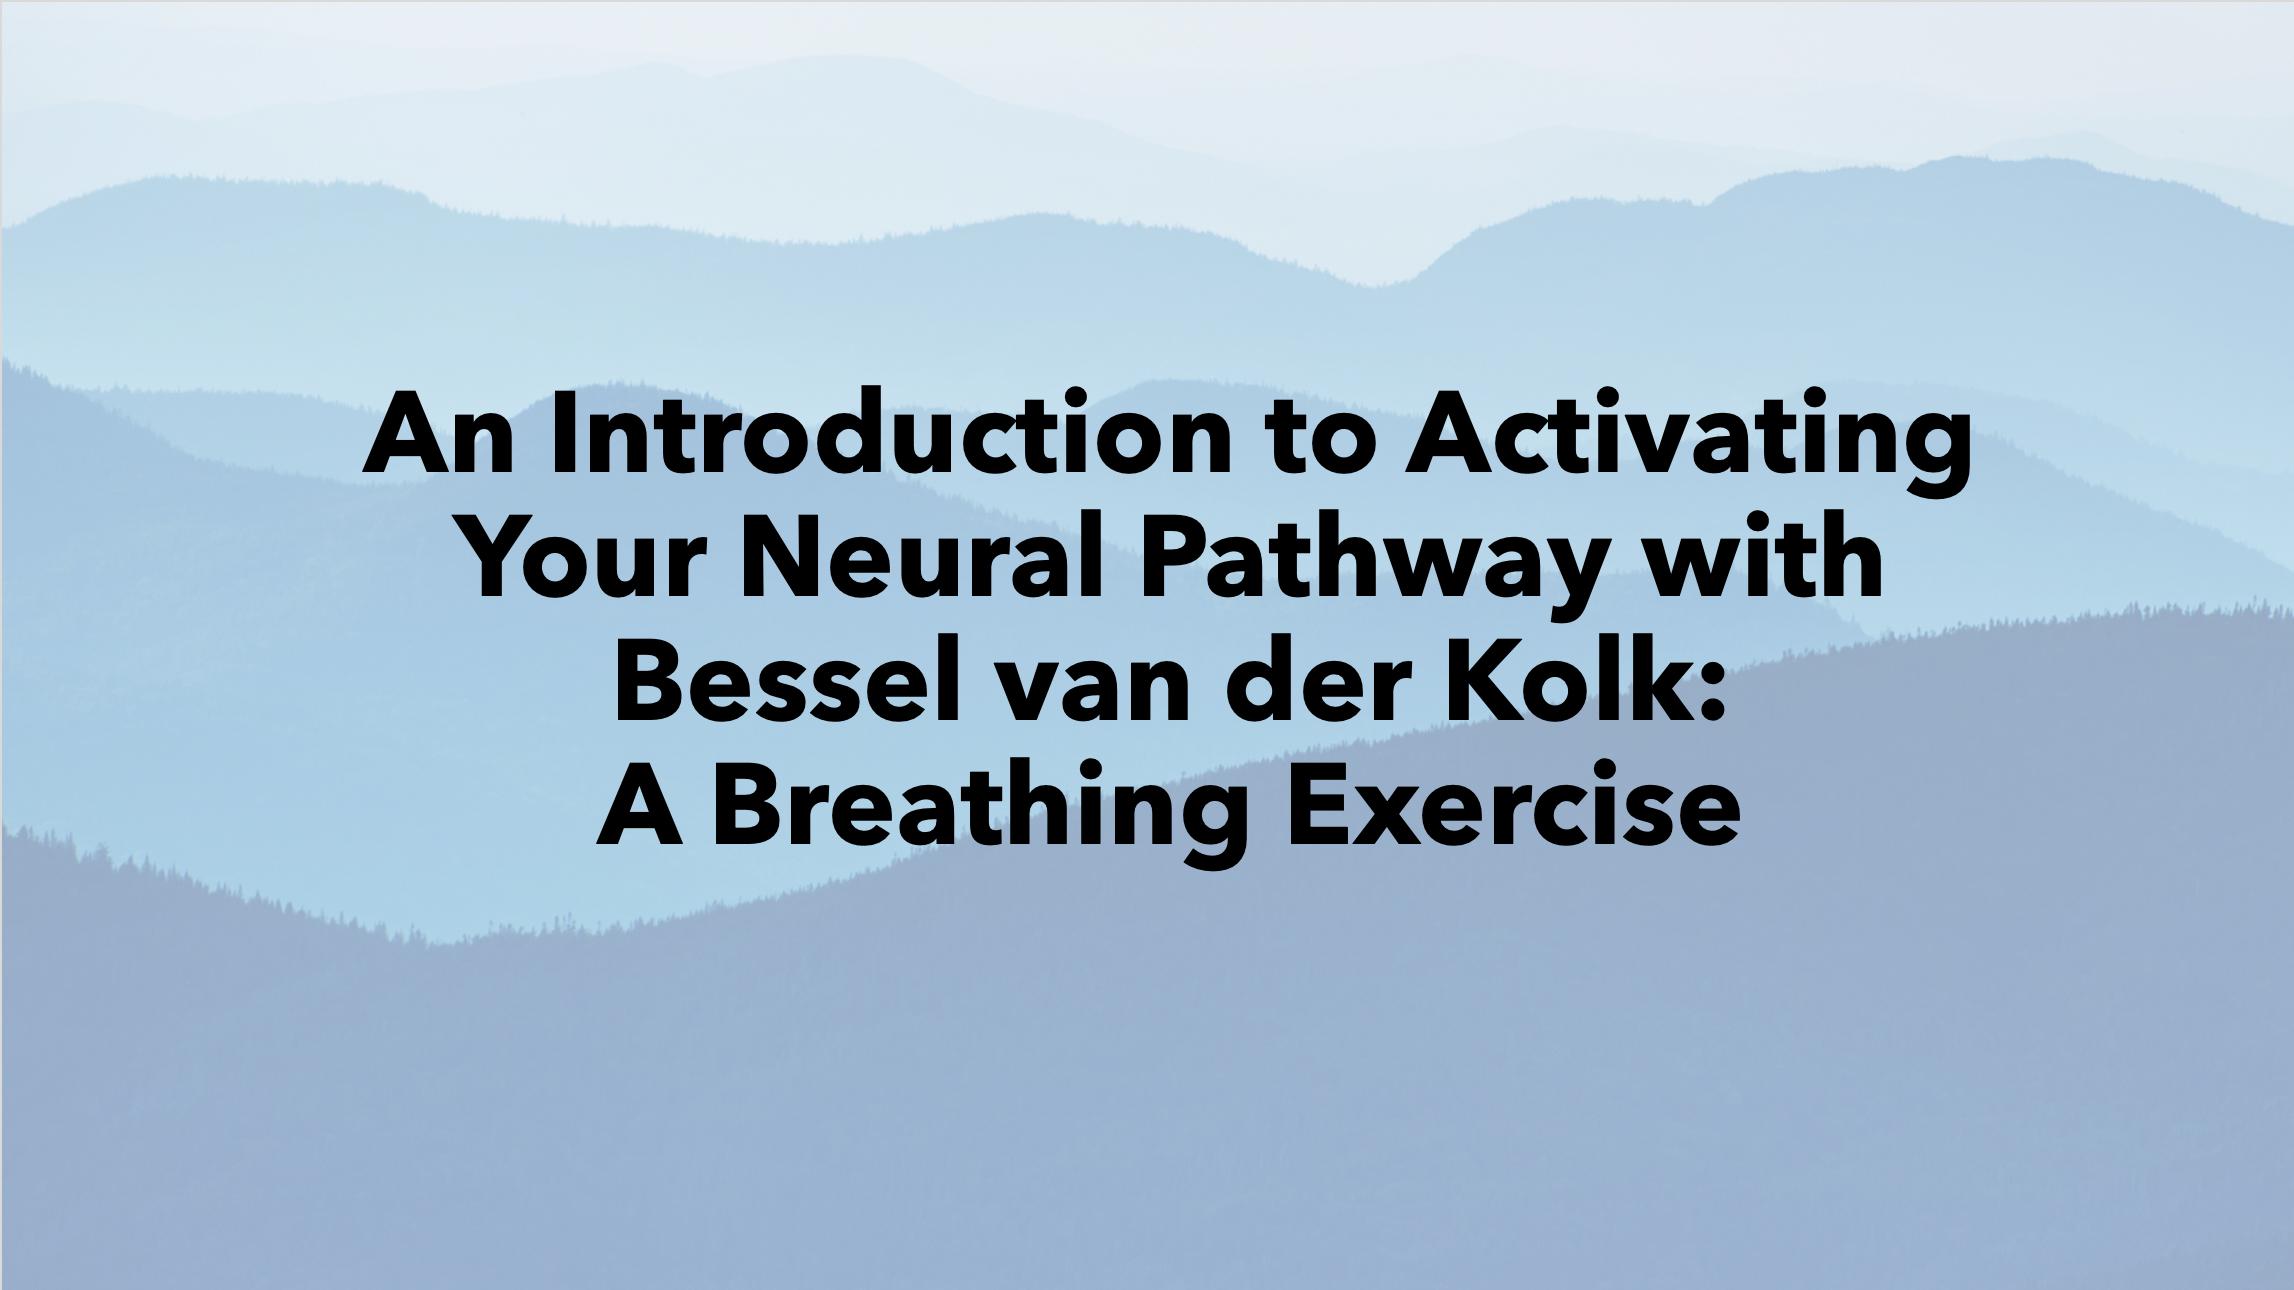 Australia: Breathing Exercise